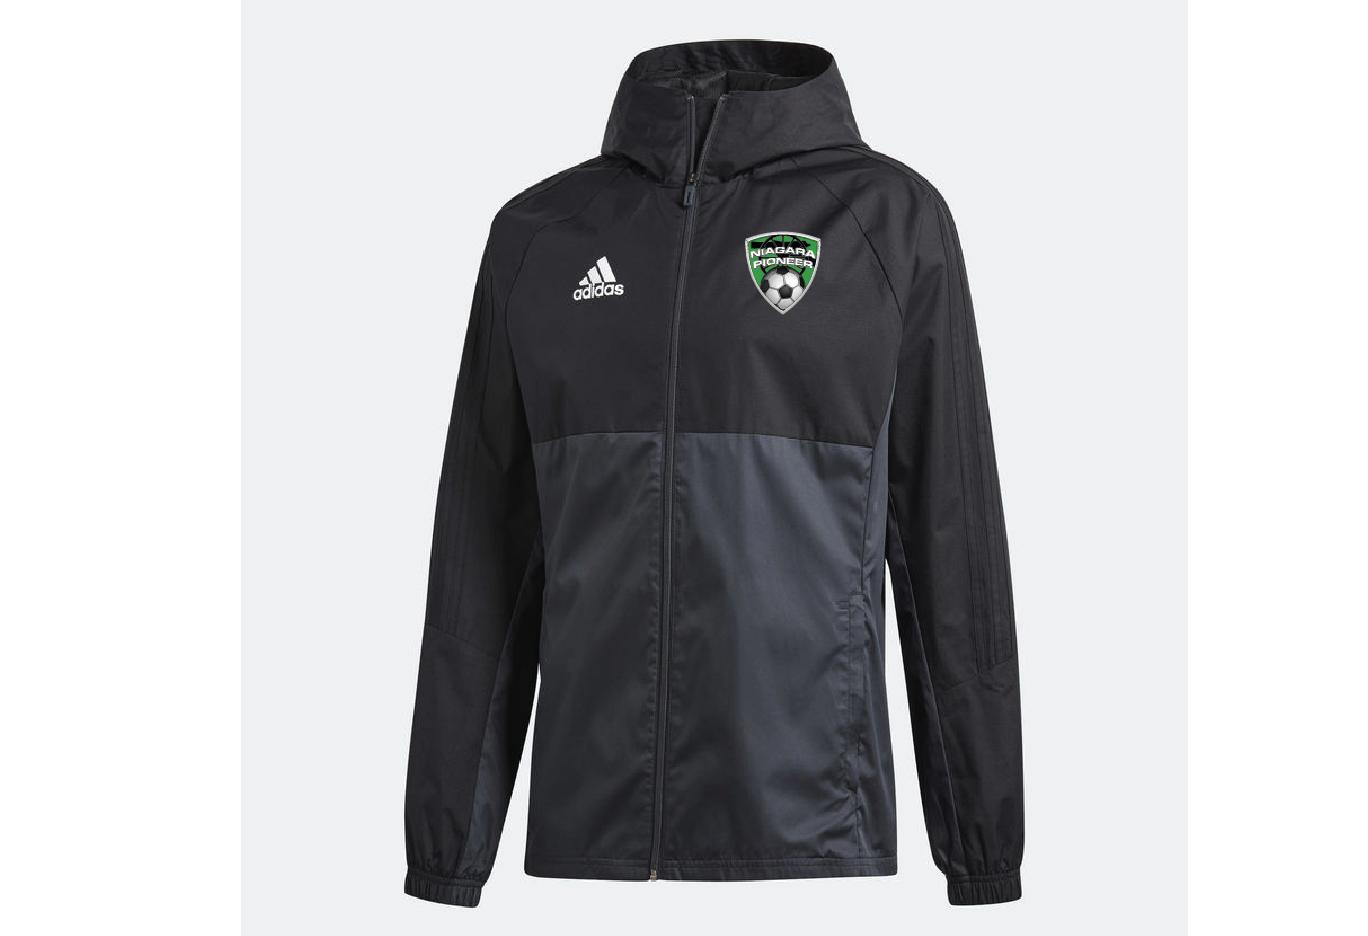 88217c4a484c 73) Adidas Tiro Rain Jacket